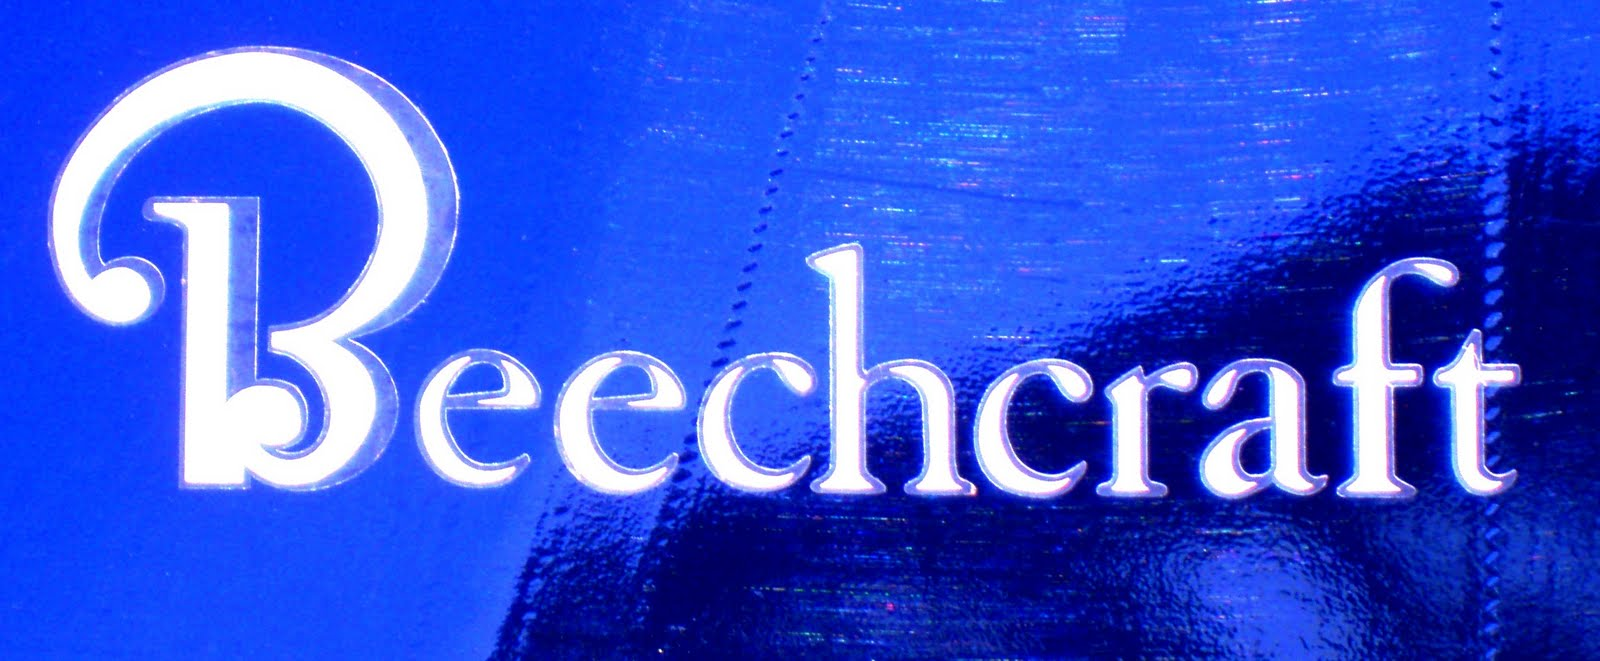 CERTIFIED AERONAUTICAL PRODUCTS CAP Tech Links